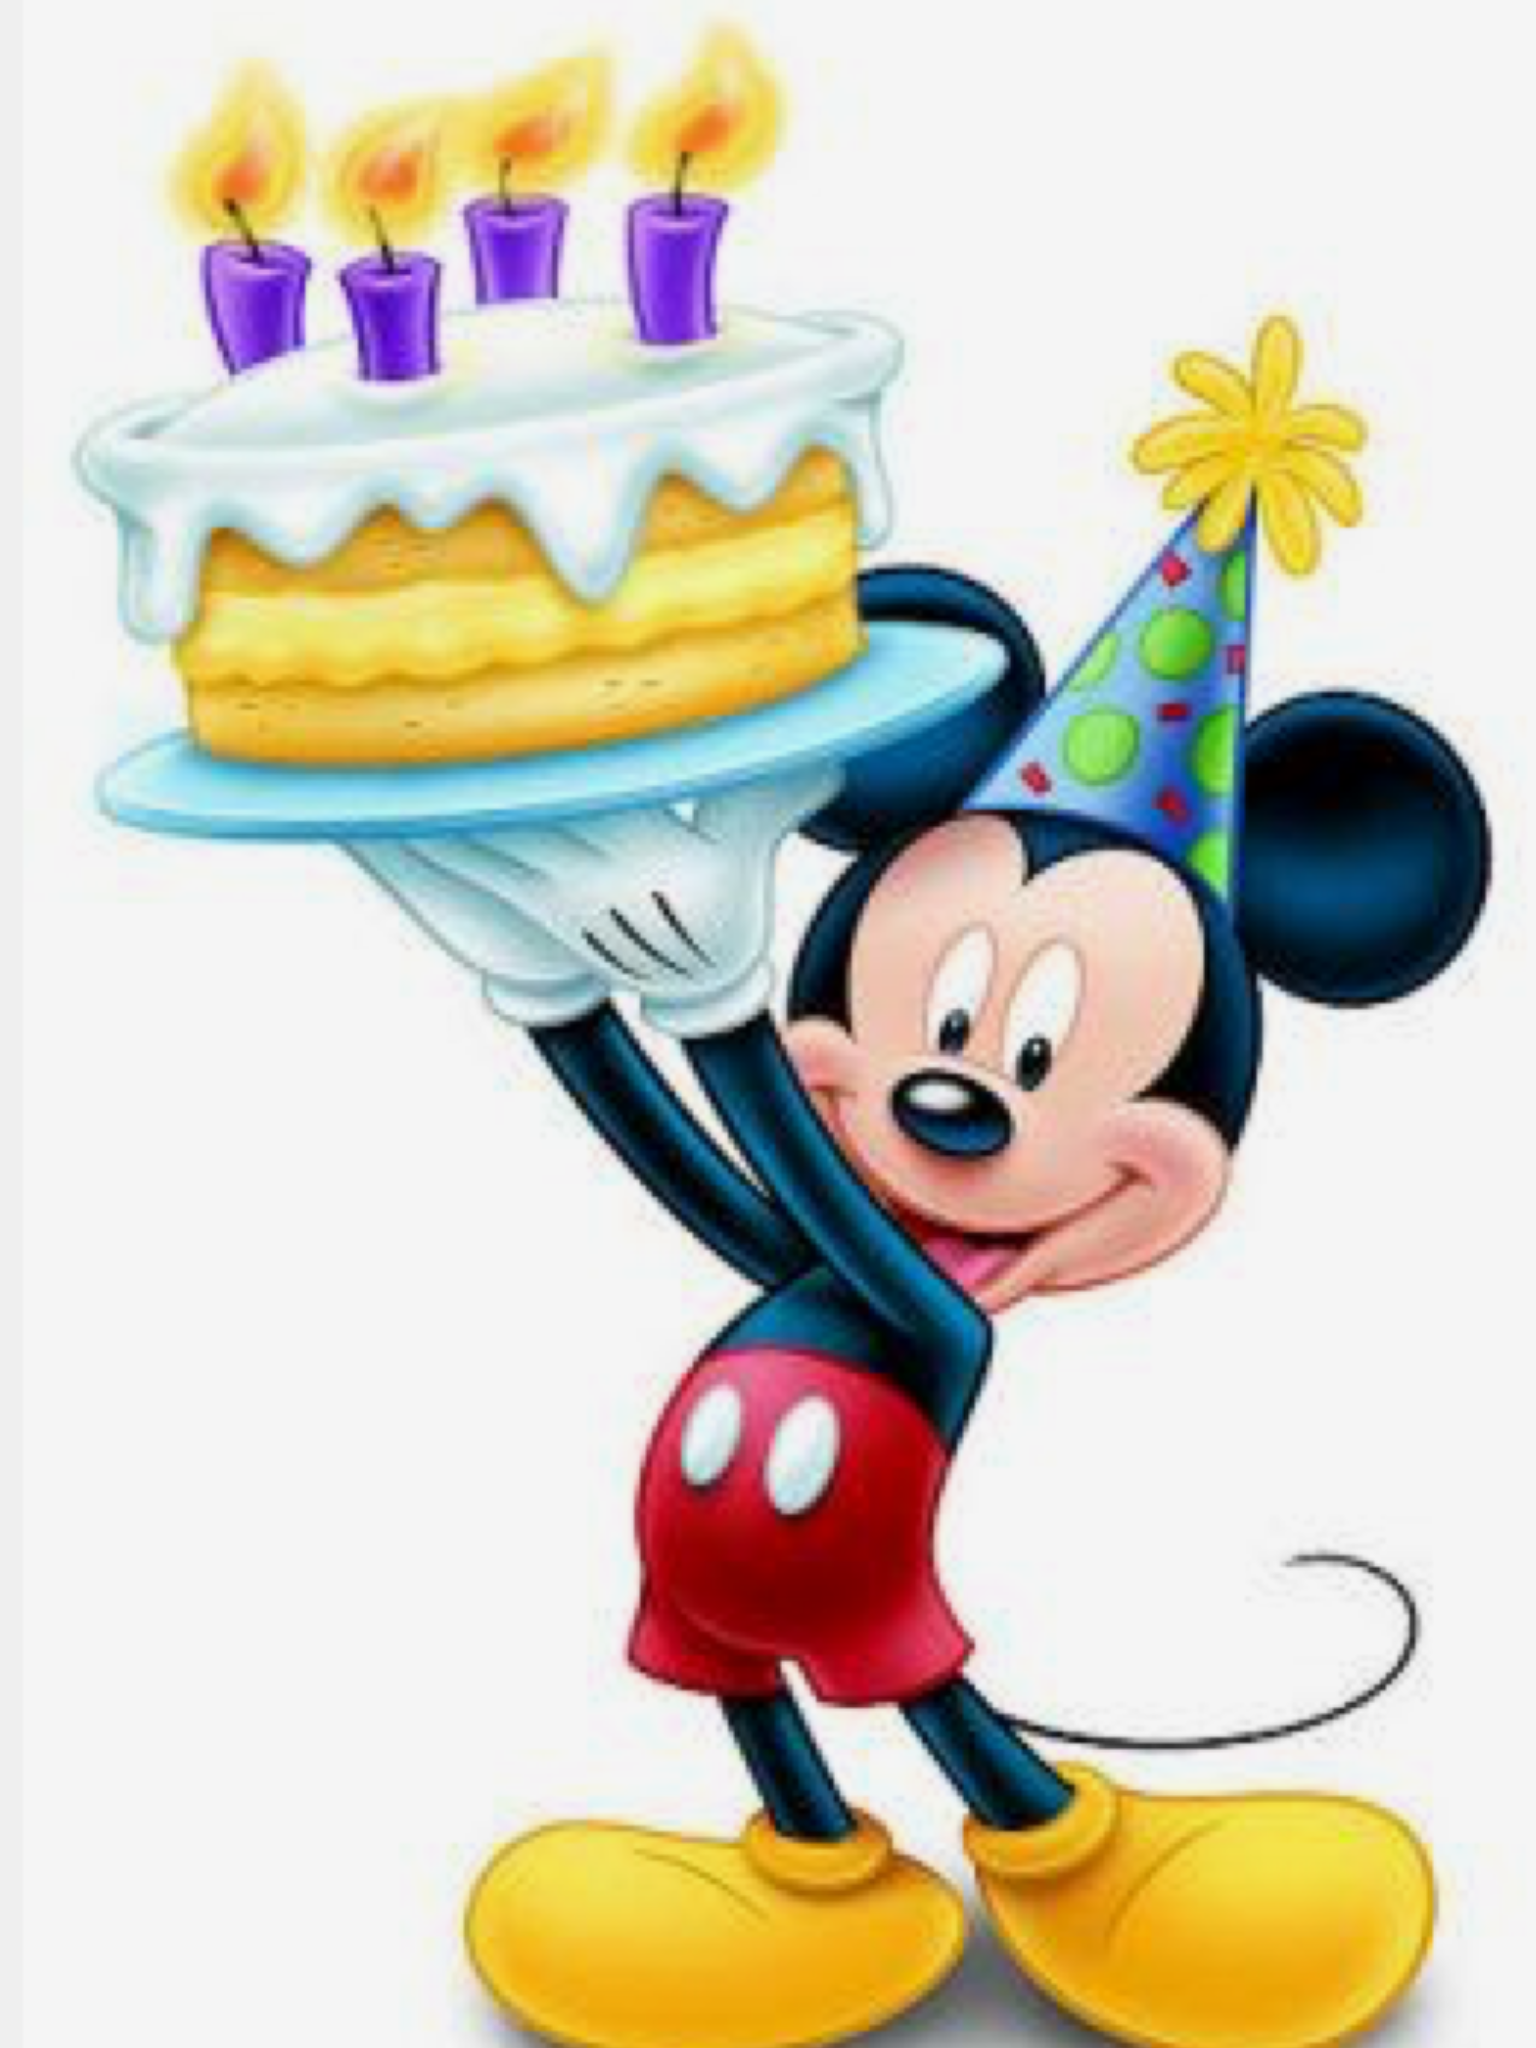 Pin By Britney Jones On Happy Bday Pinterest Mice Disney Fun